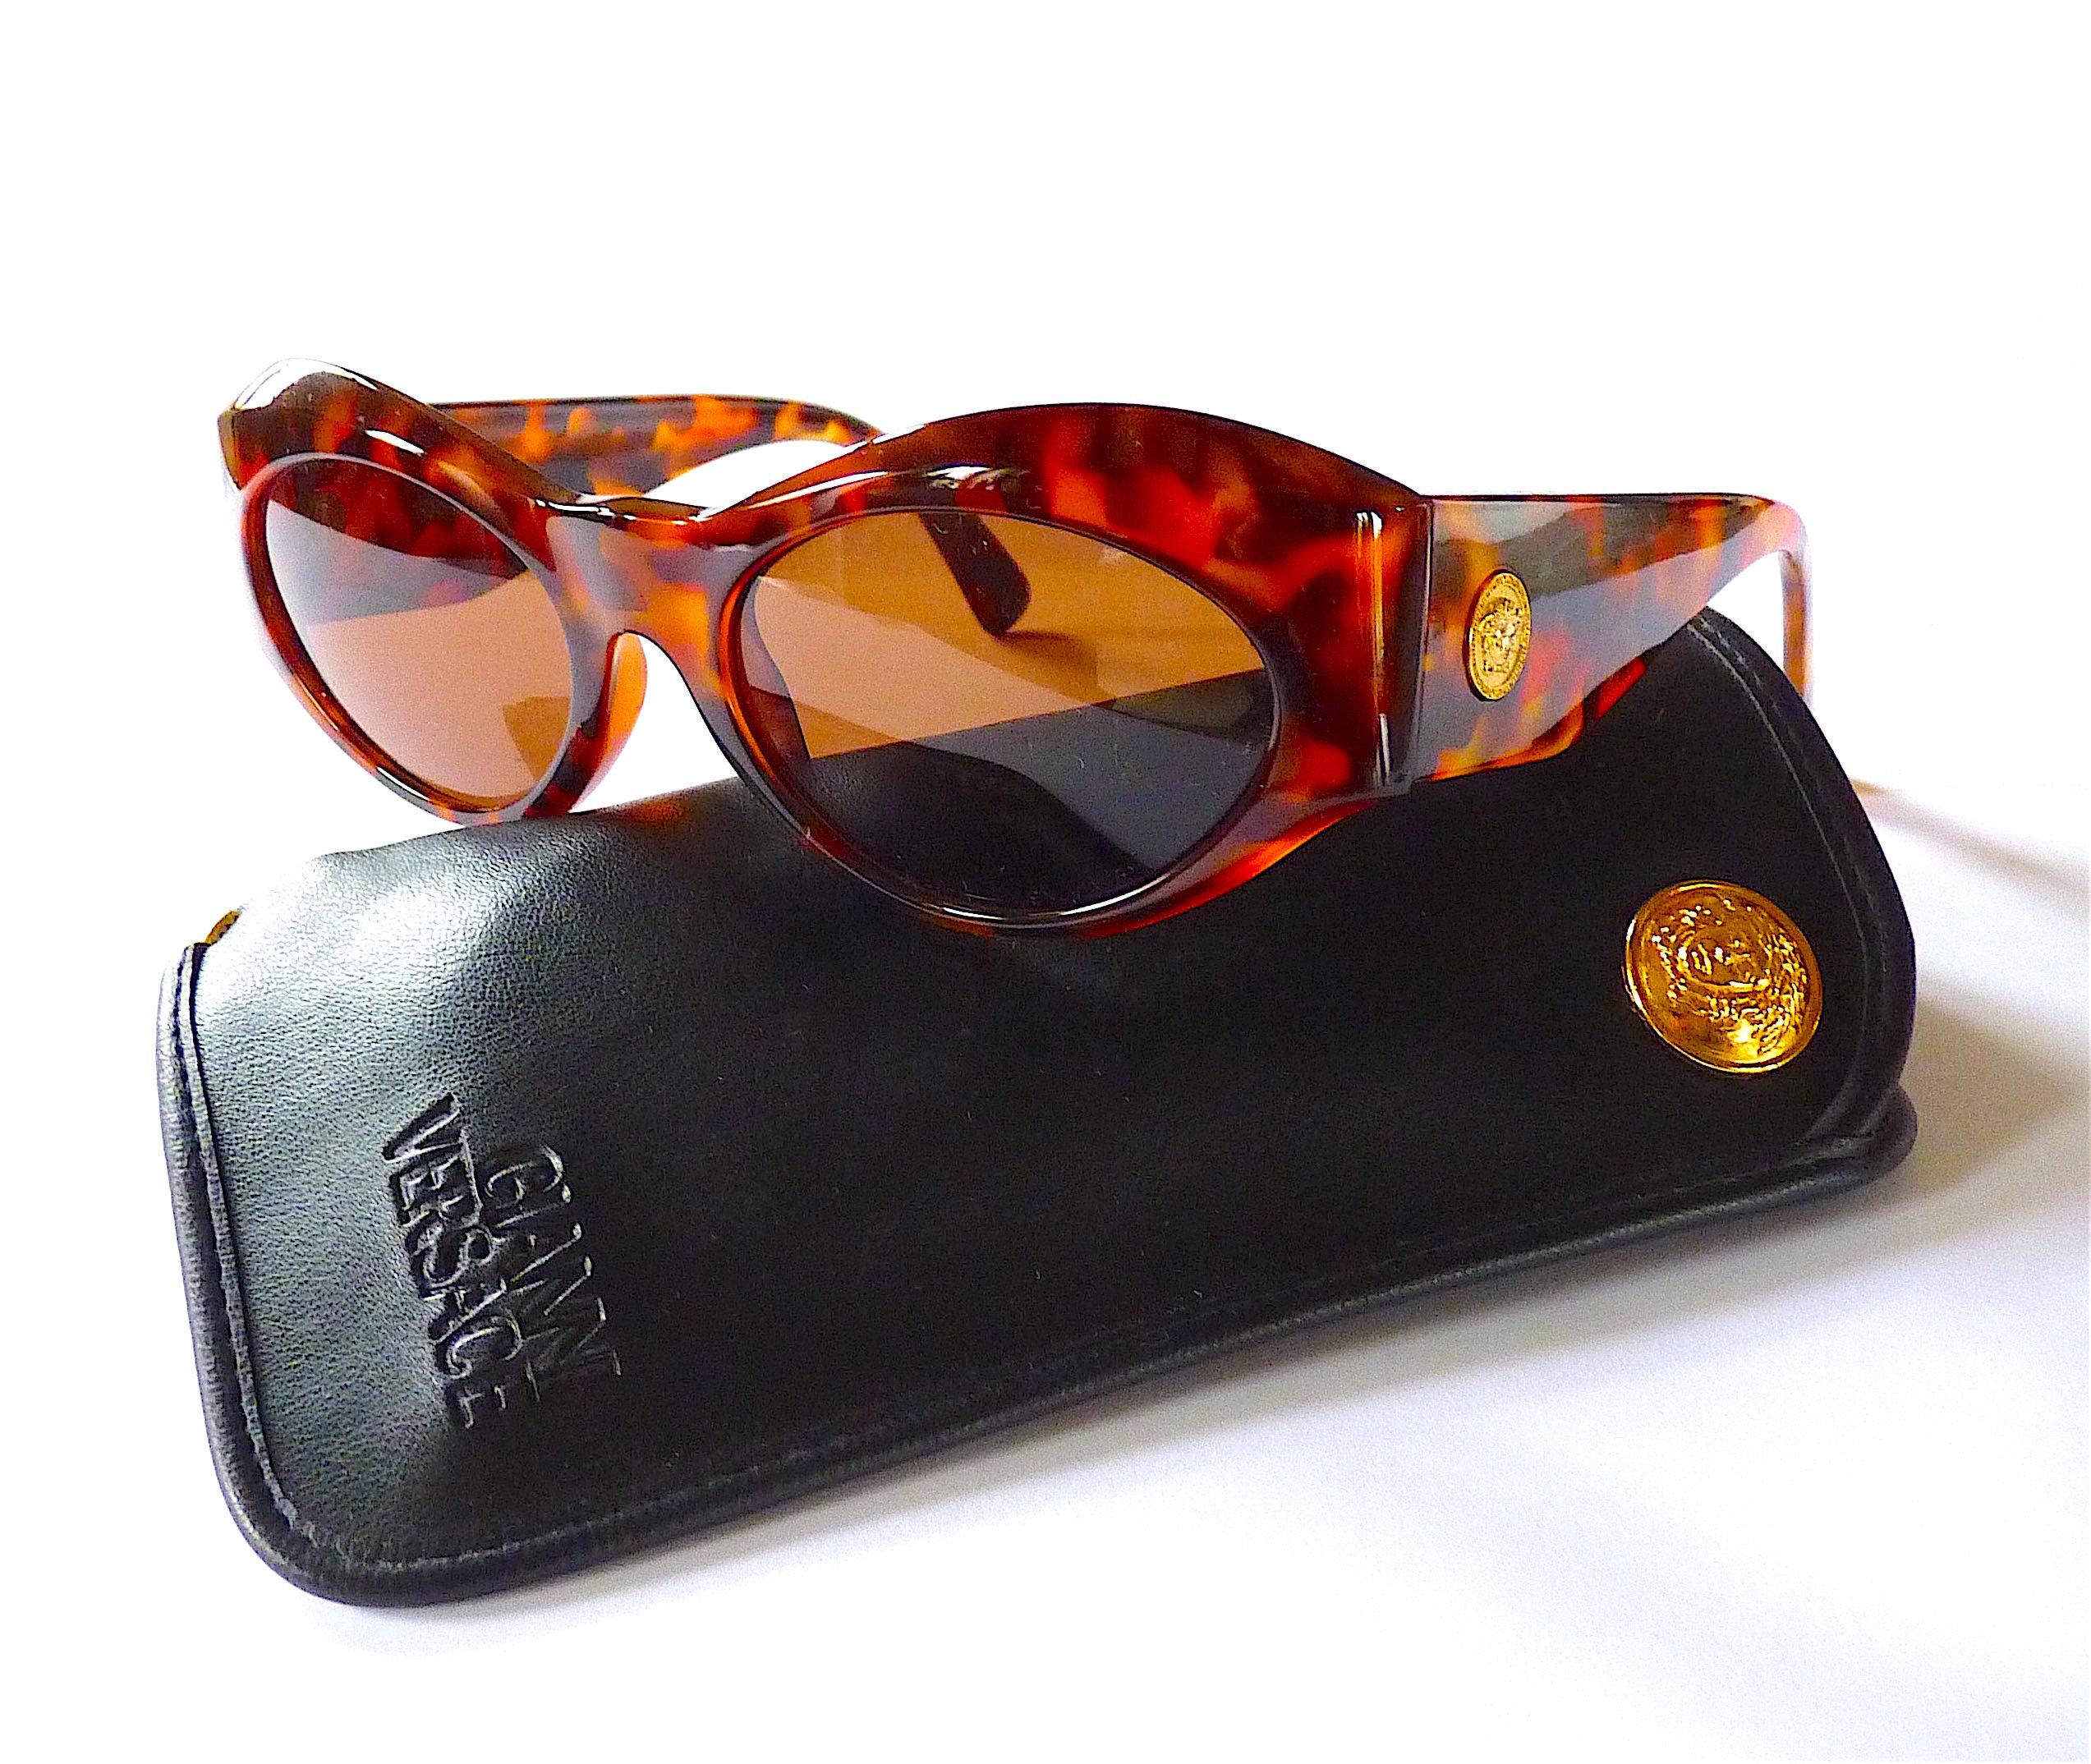 7a8954efcb VERSACE Medusa Head Sunglasses Versace MOD.374 Cat Eye